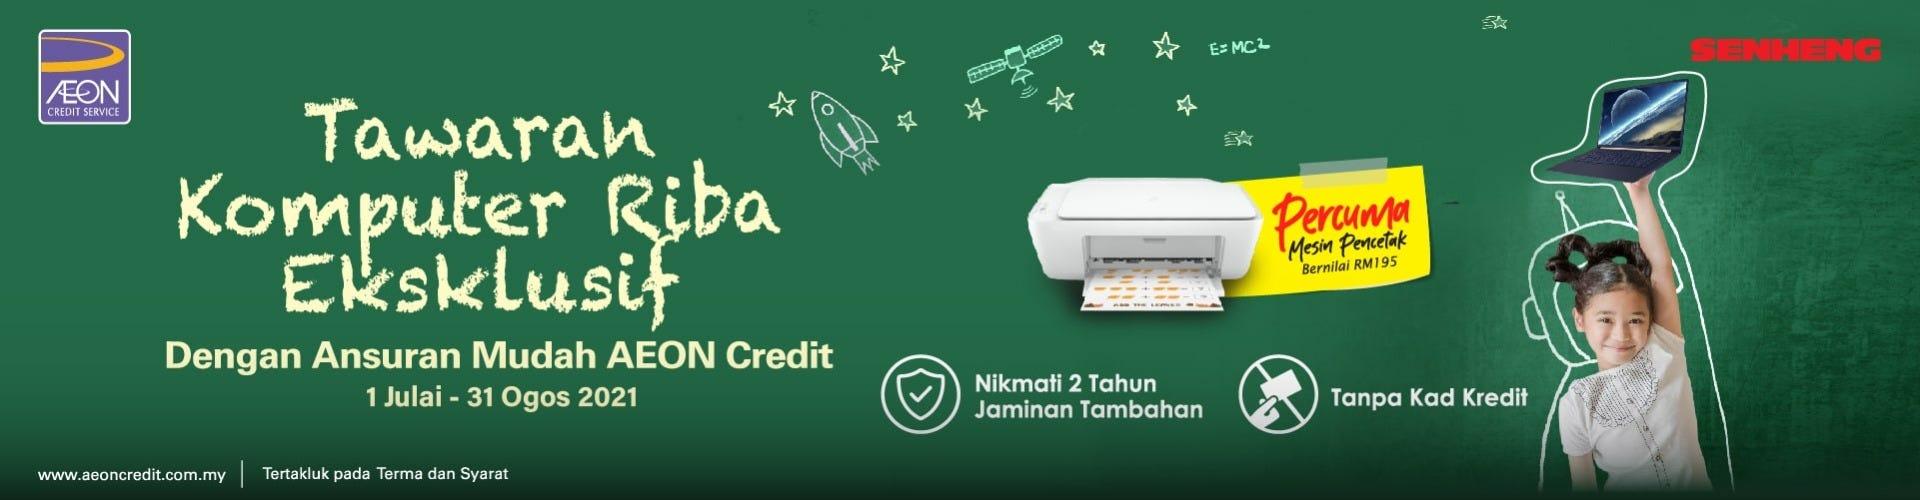 PlusONE AEON Tawaran Komputer